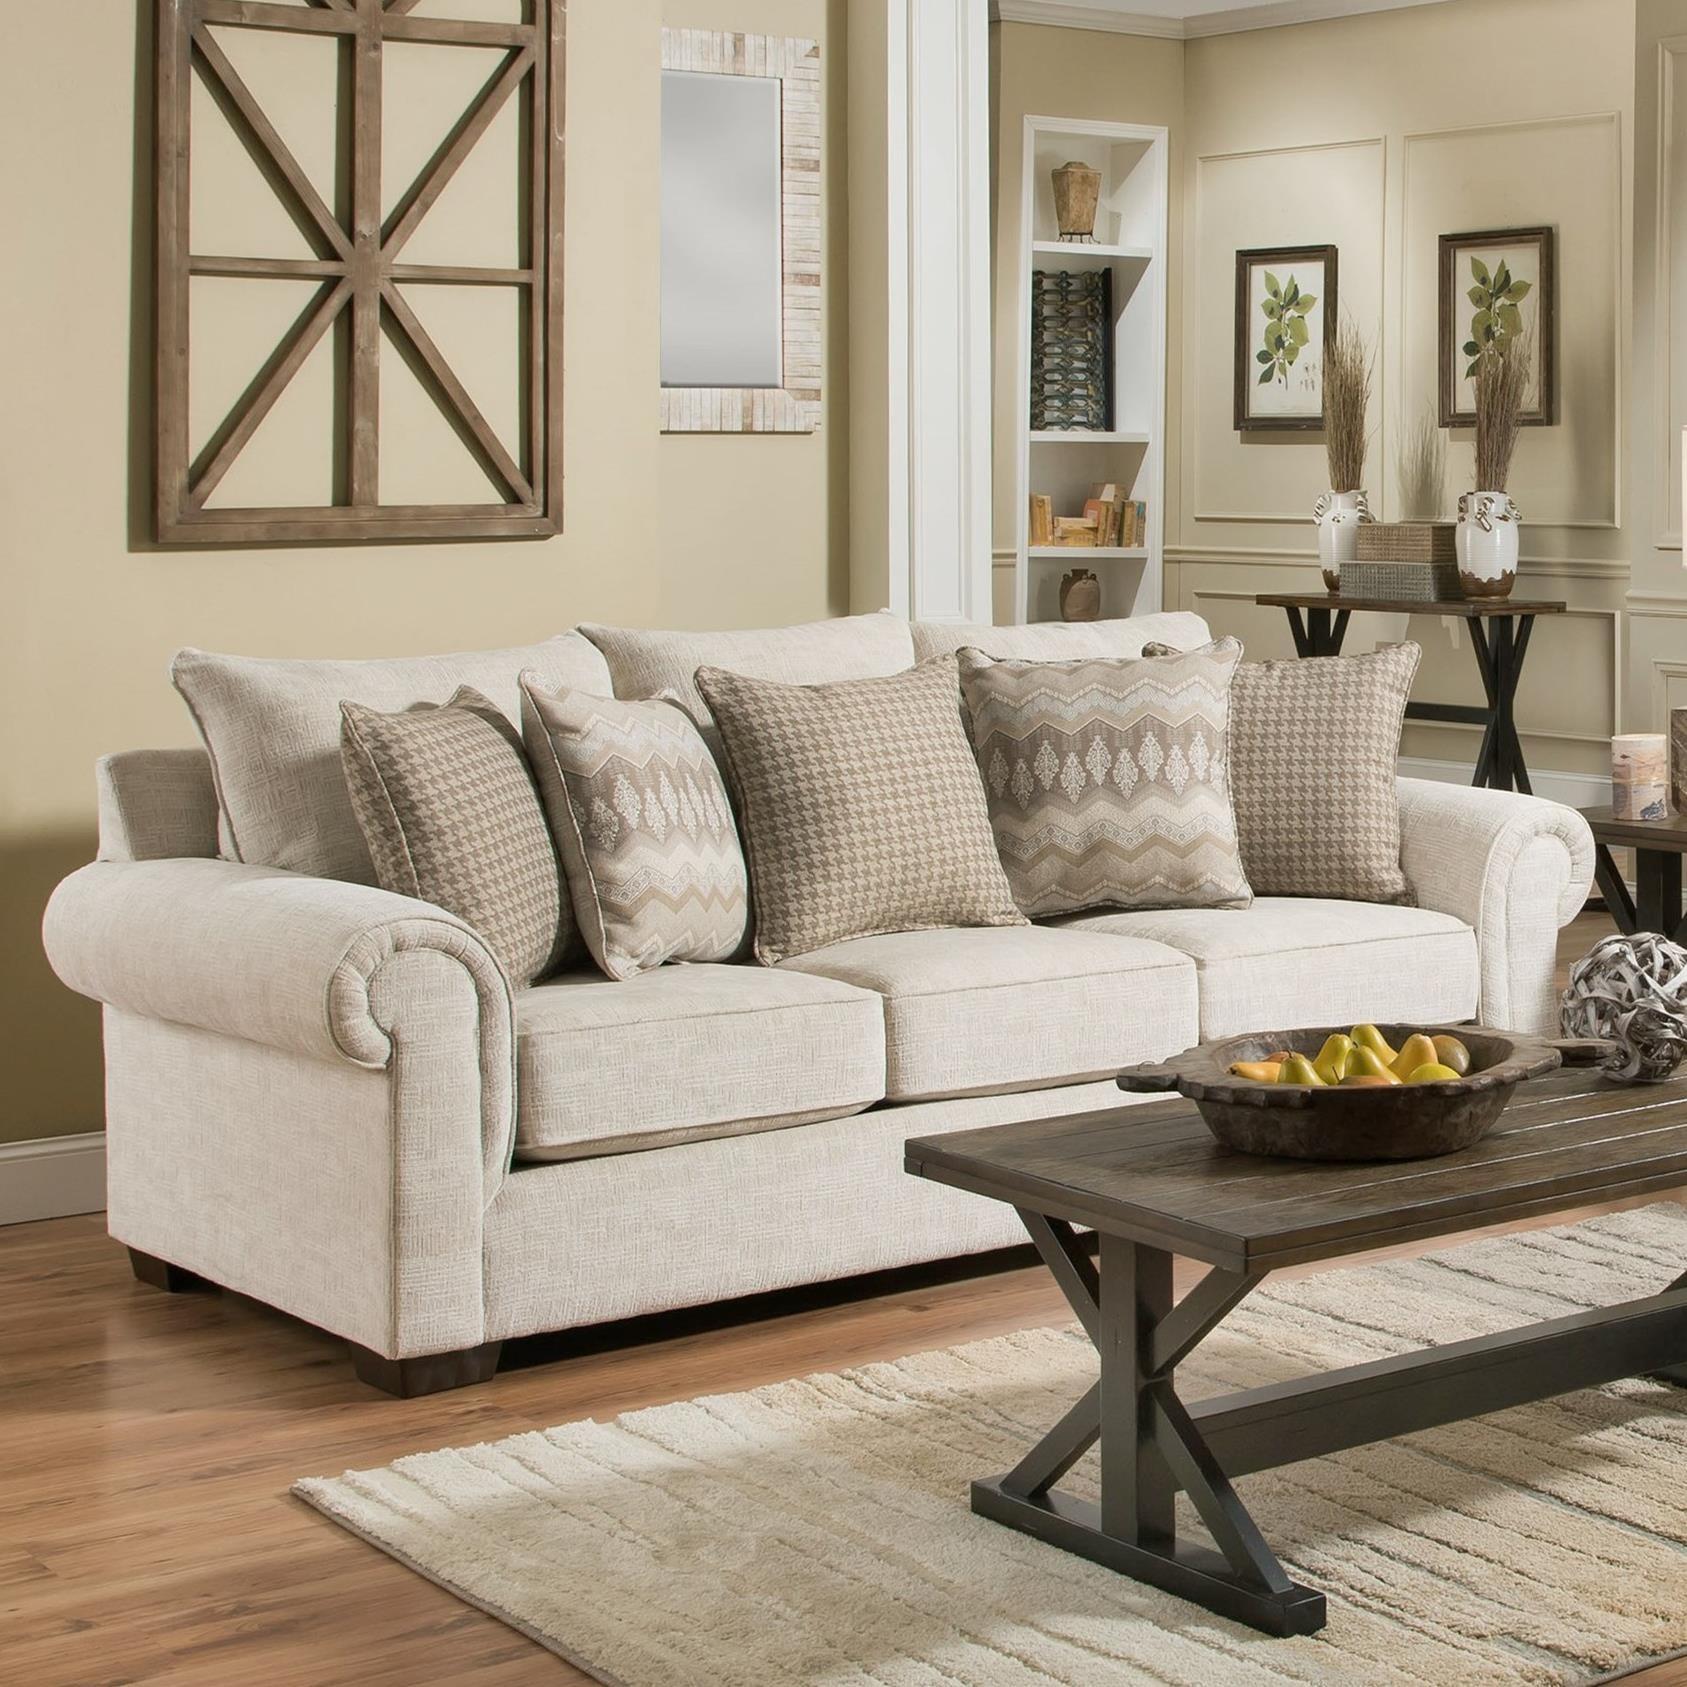 7592BR Sofa Sleeper by United Furniture Industries at Pilgrim Furniture City